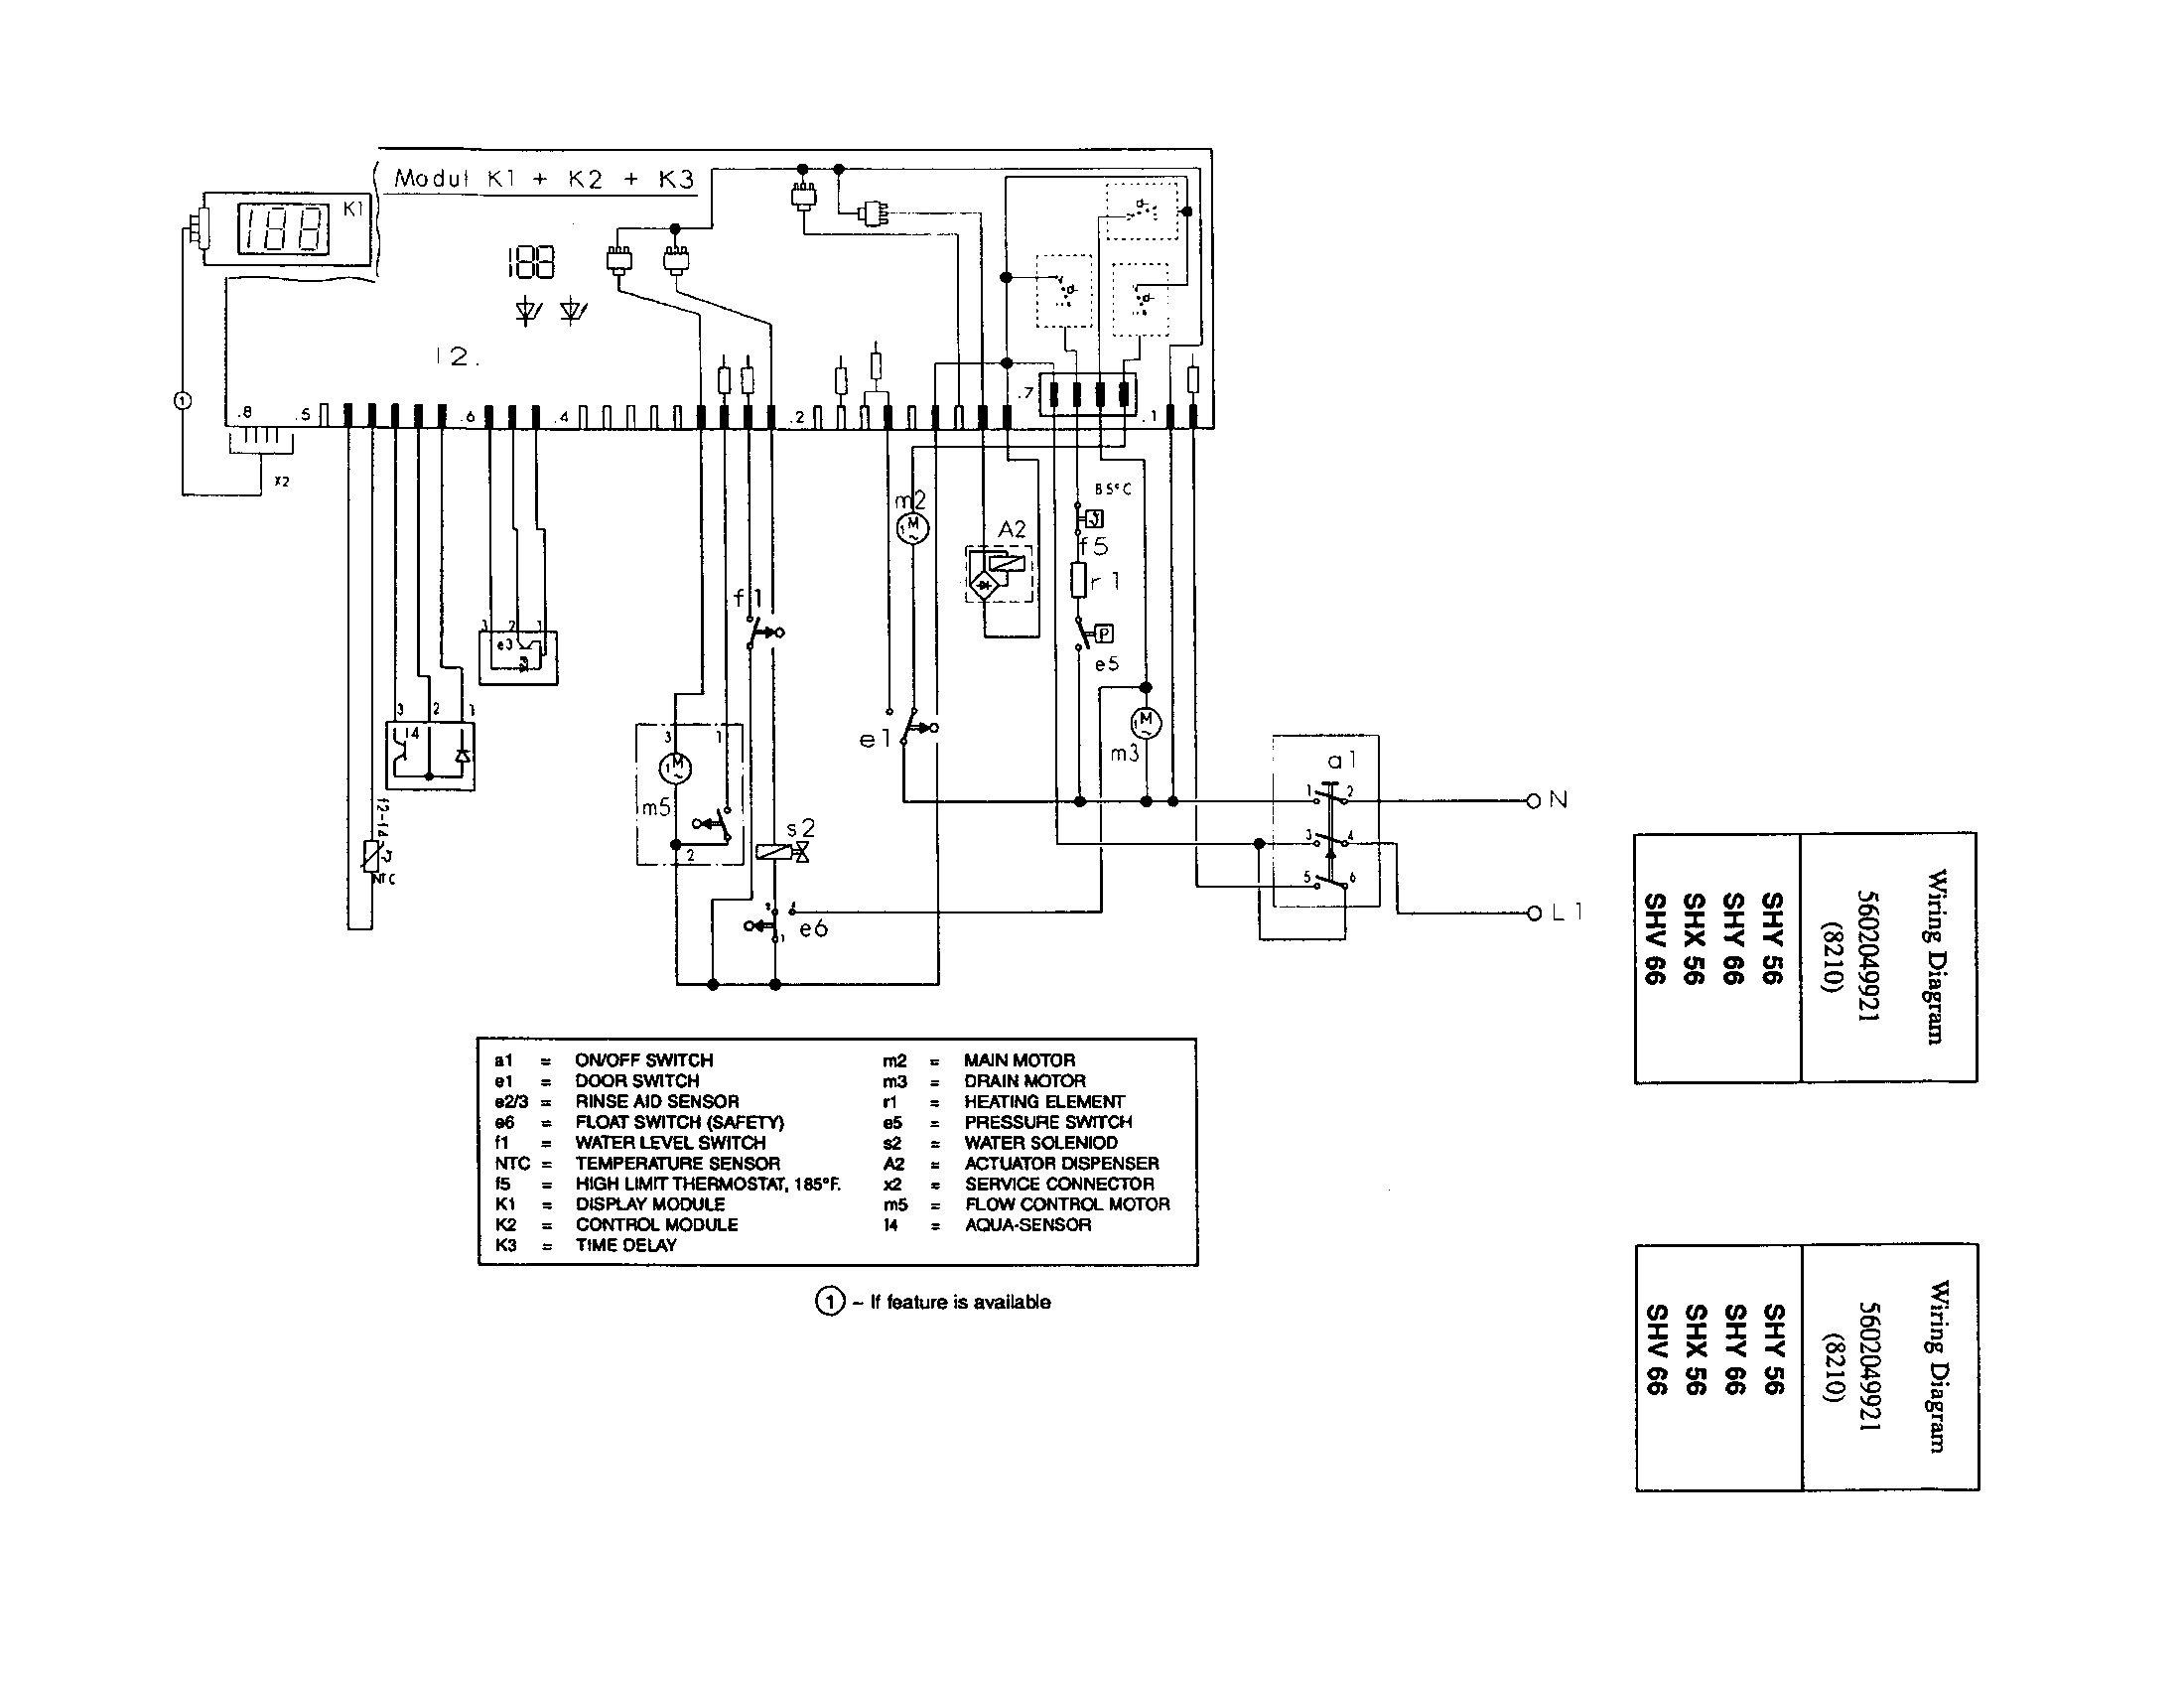 Bosch Wiring Diagram Shu5315ucu12